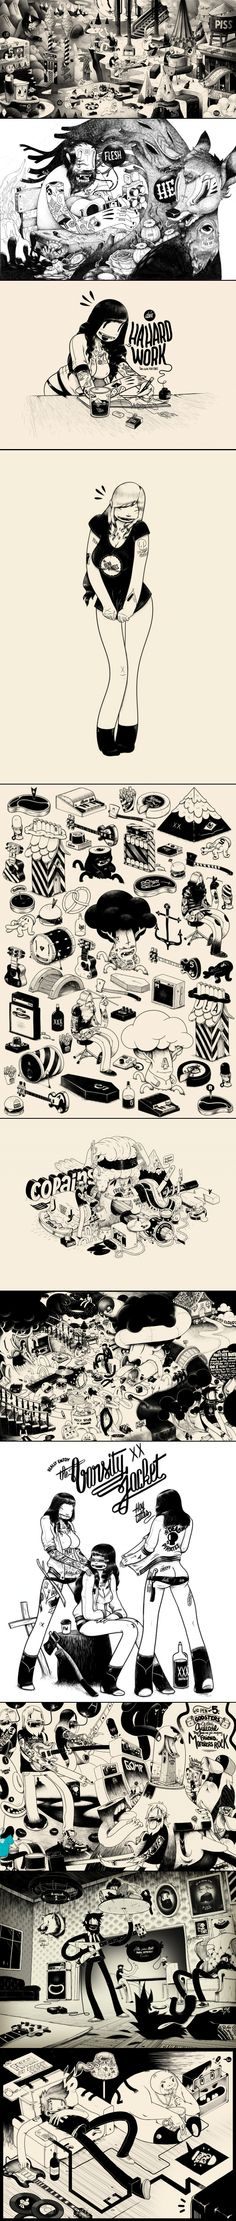 mcbess comic book #illustration